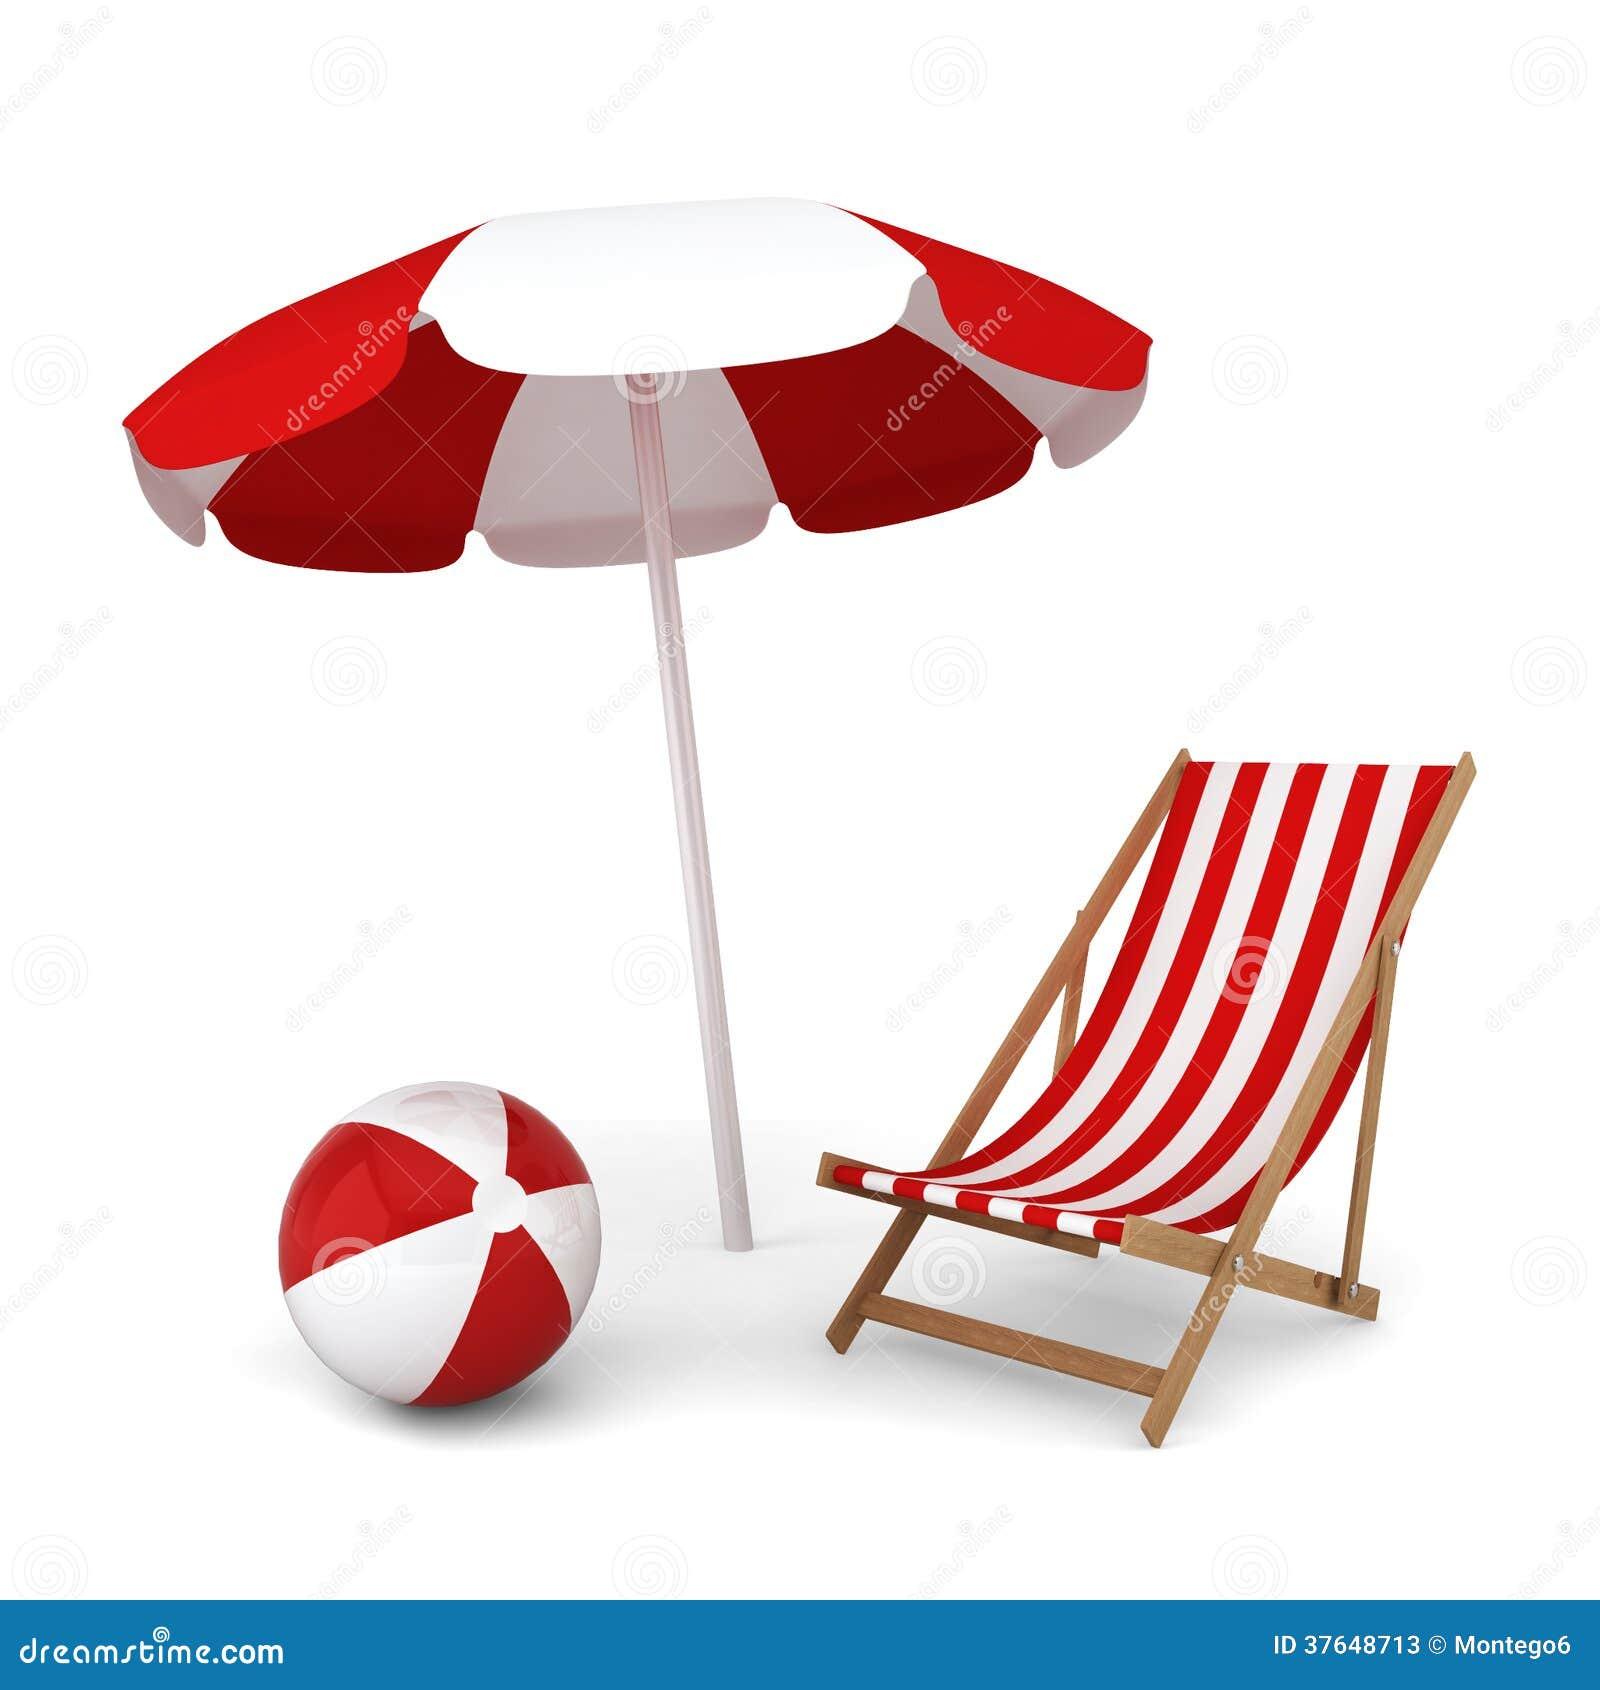 Beach chair with umbrella - Beach Umbrella Chair And Ball Stock Photos